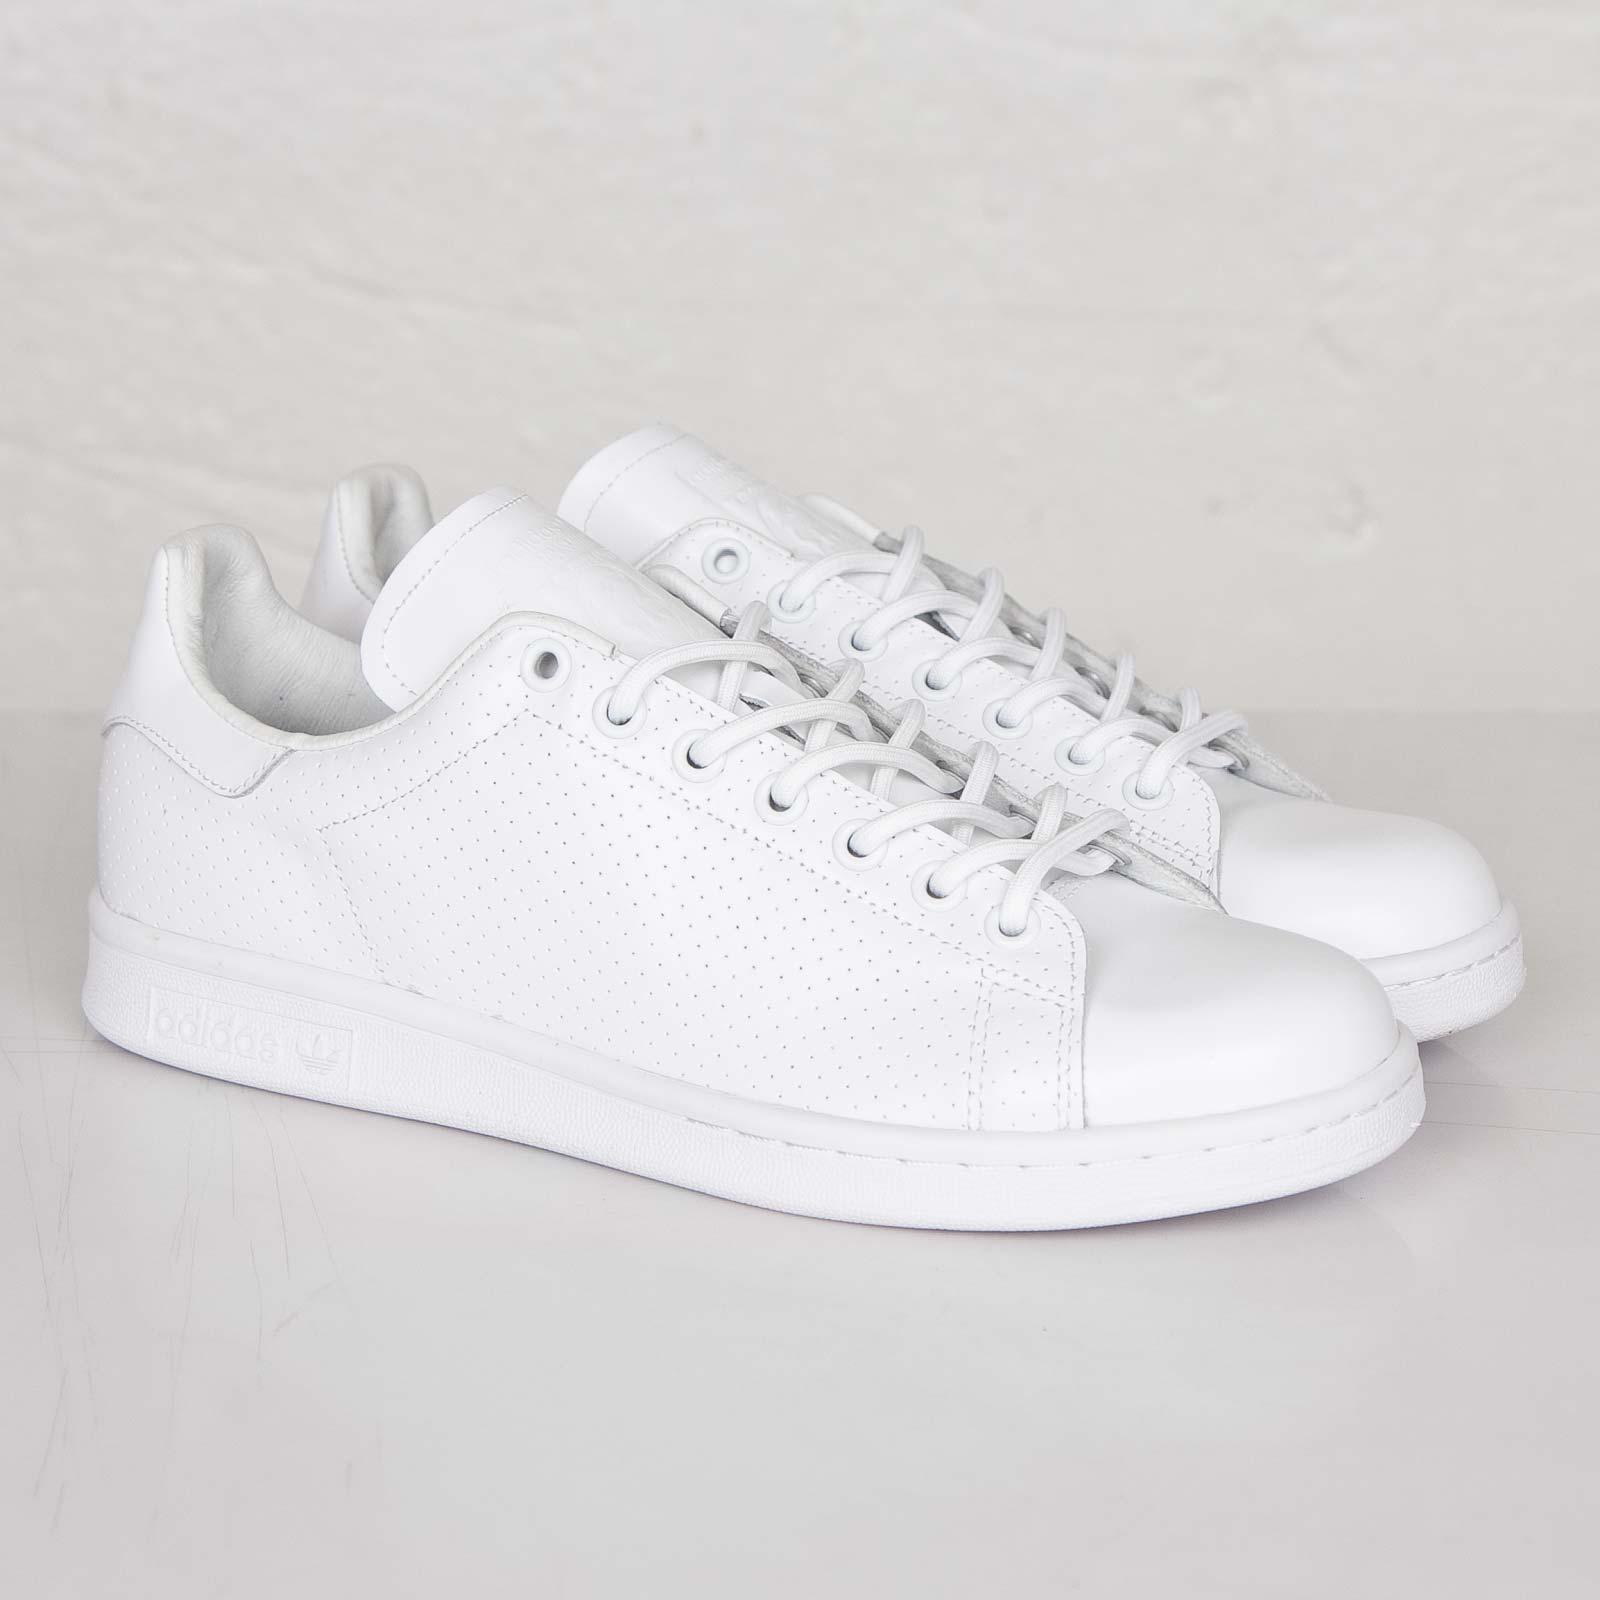 new style bfa0e b59b8 adidas Stan Smith - B24365 - Sneakersnstuff   sneakers ...